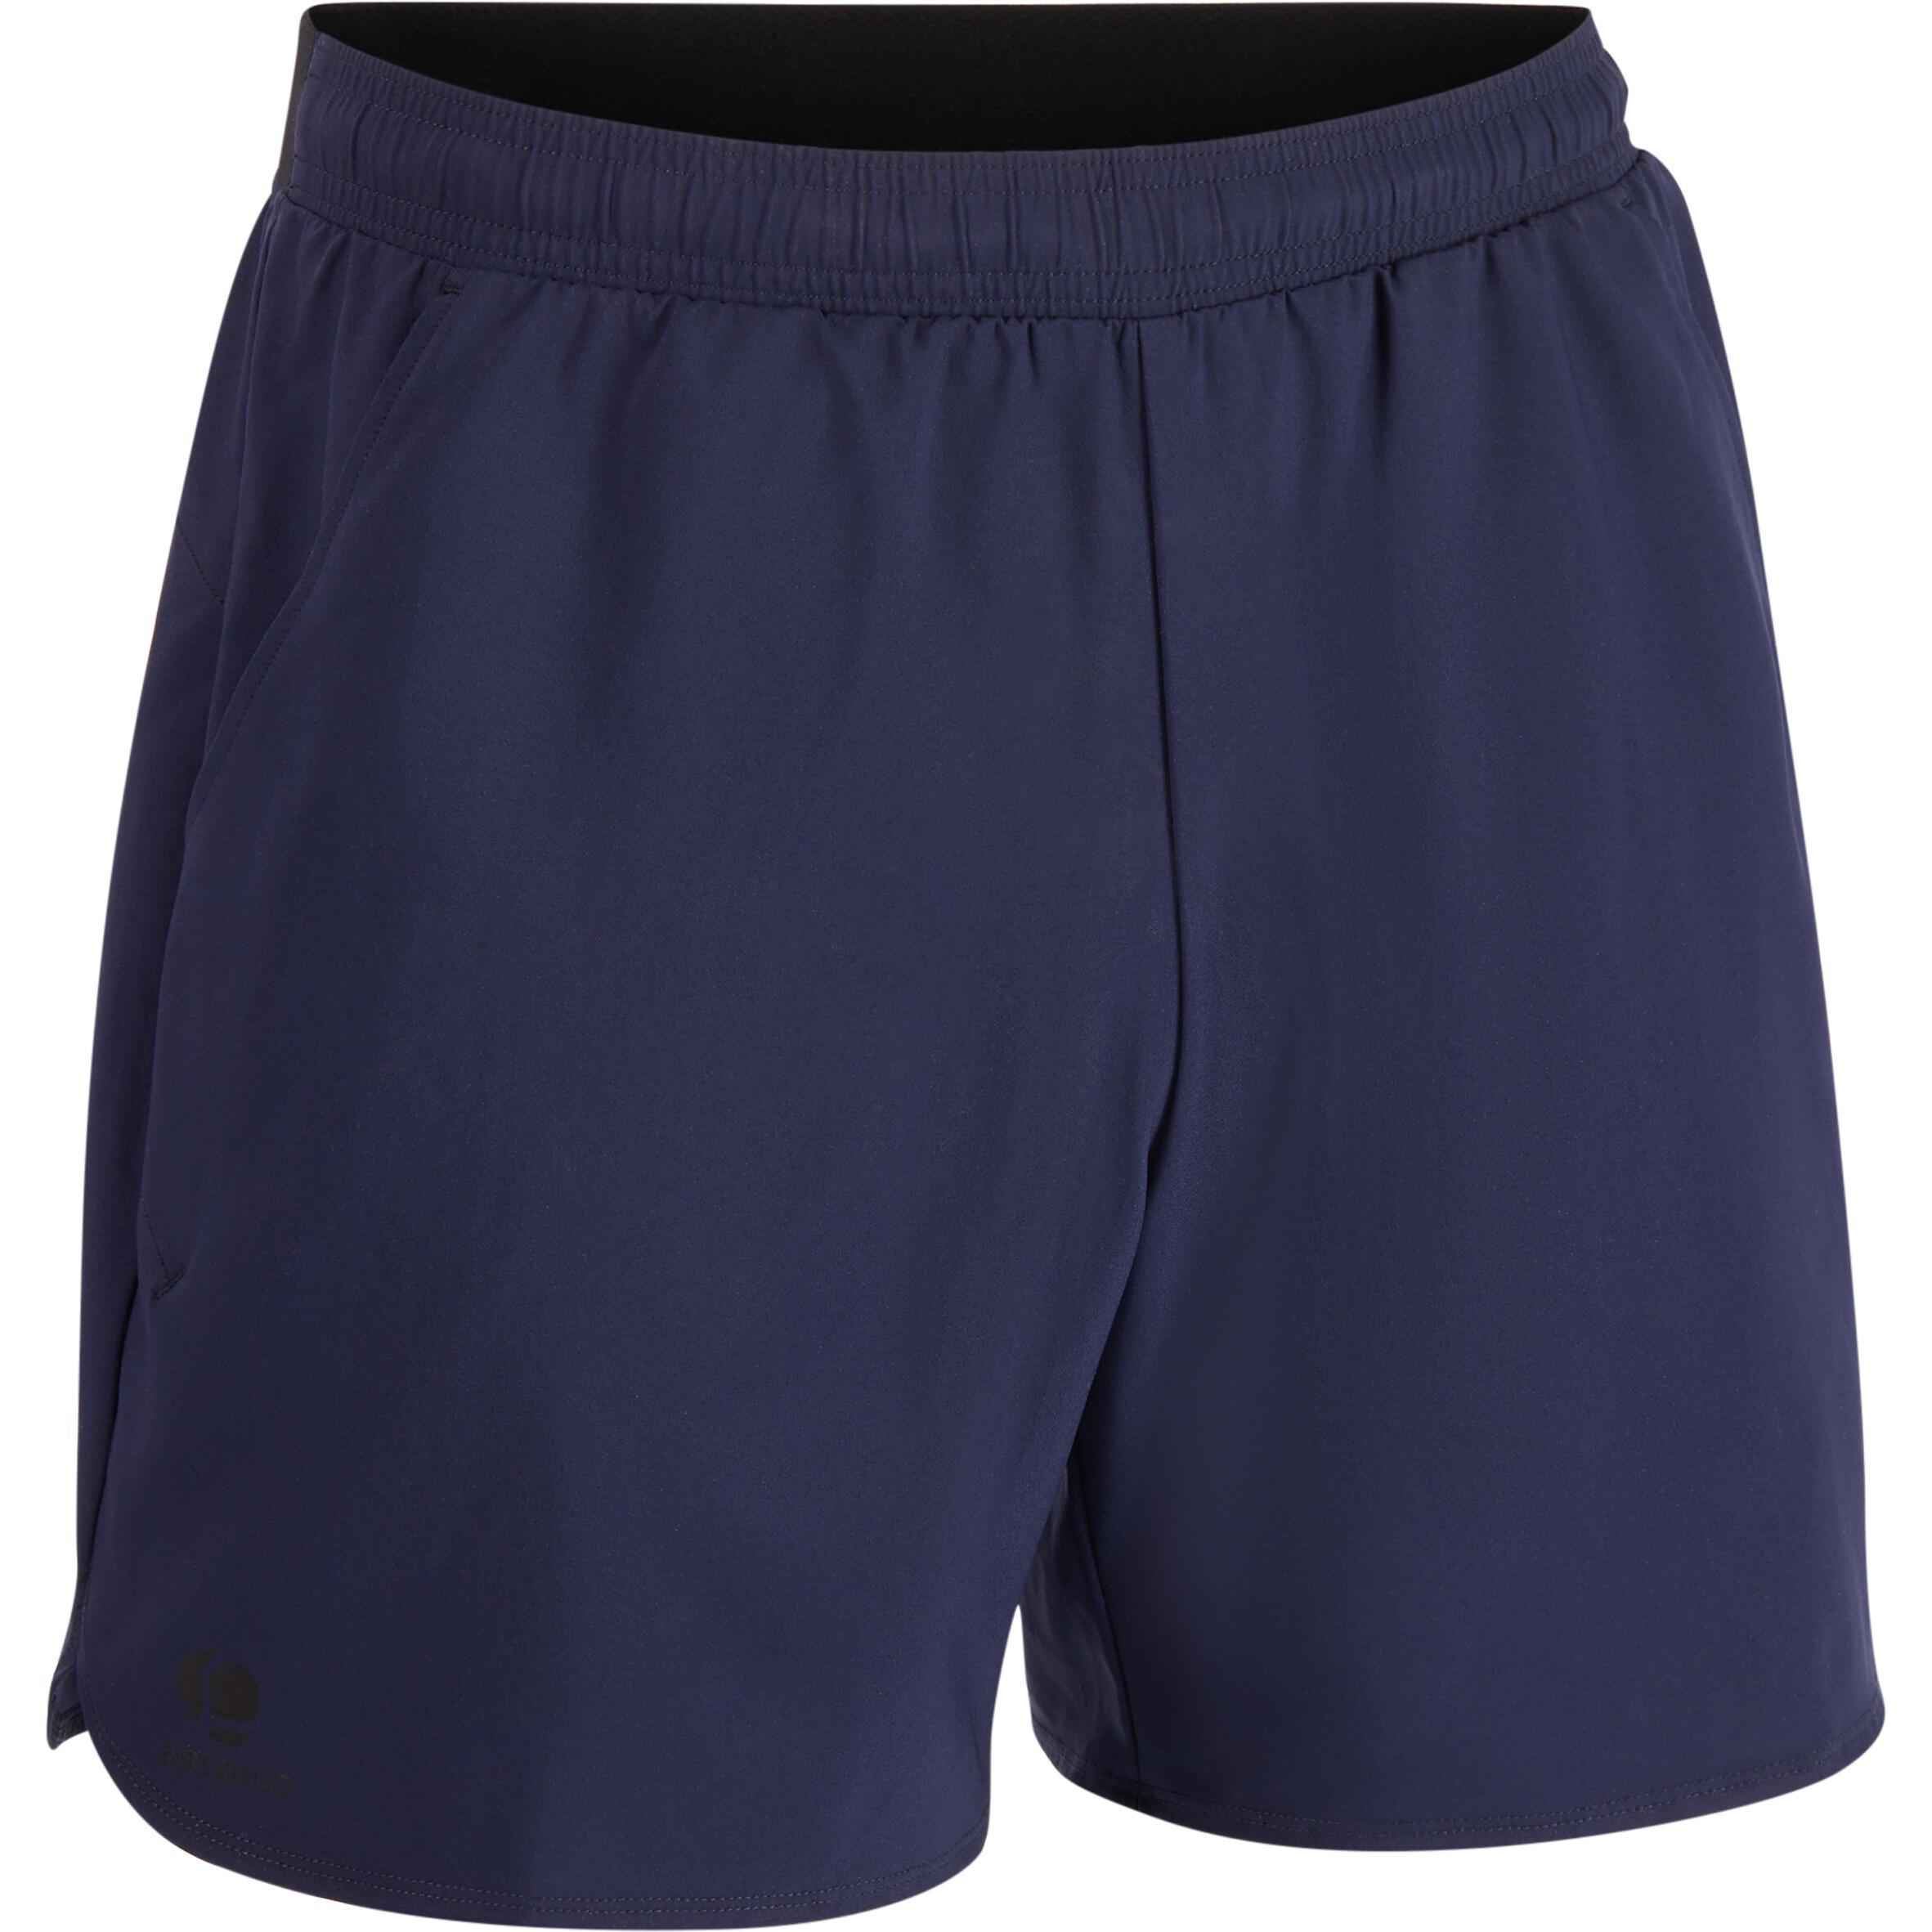 Shorts Dry 500 Court Tennishose H marineblau | Sportbekleidung > Sporthosen > Tennisshorts | Blau - Schwarz | Artengo